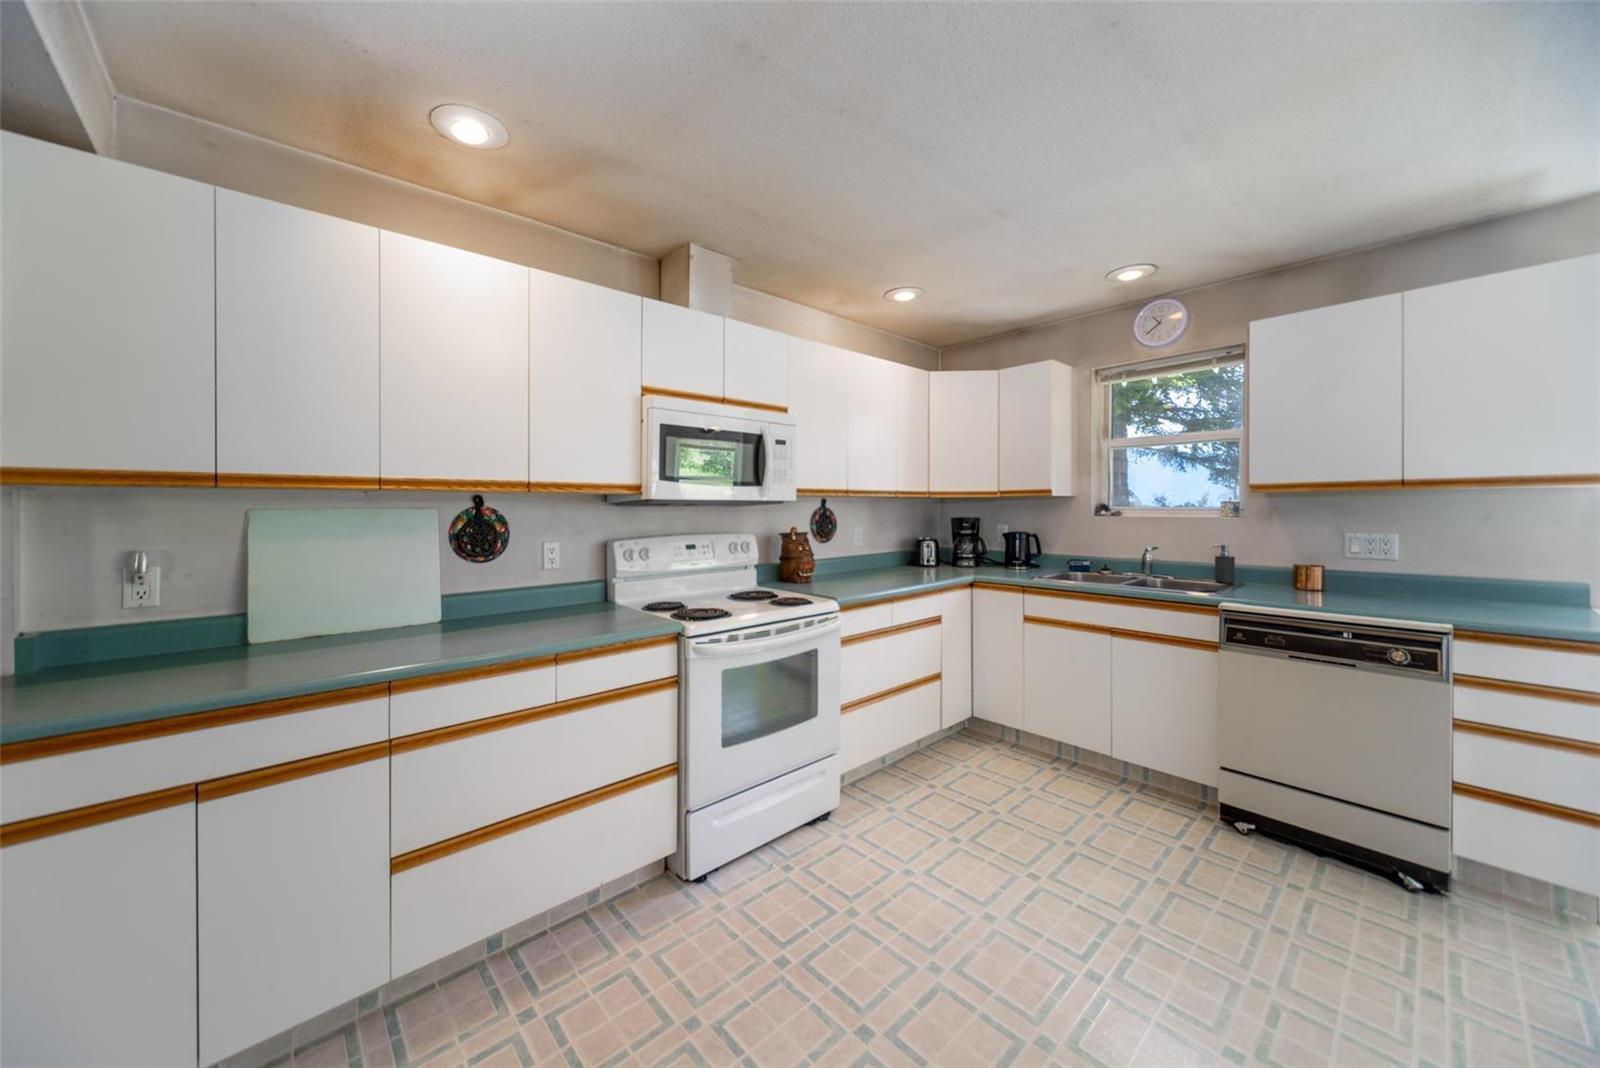 4602 Schubert Road,, Armstrong, British Columbia  V0E 1B4 - Photo 13 - 10232683